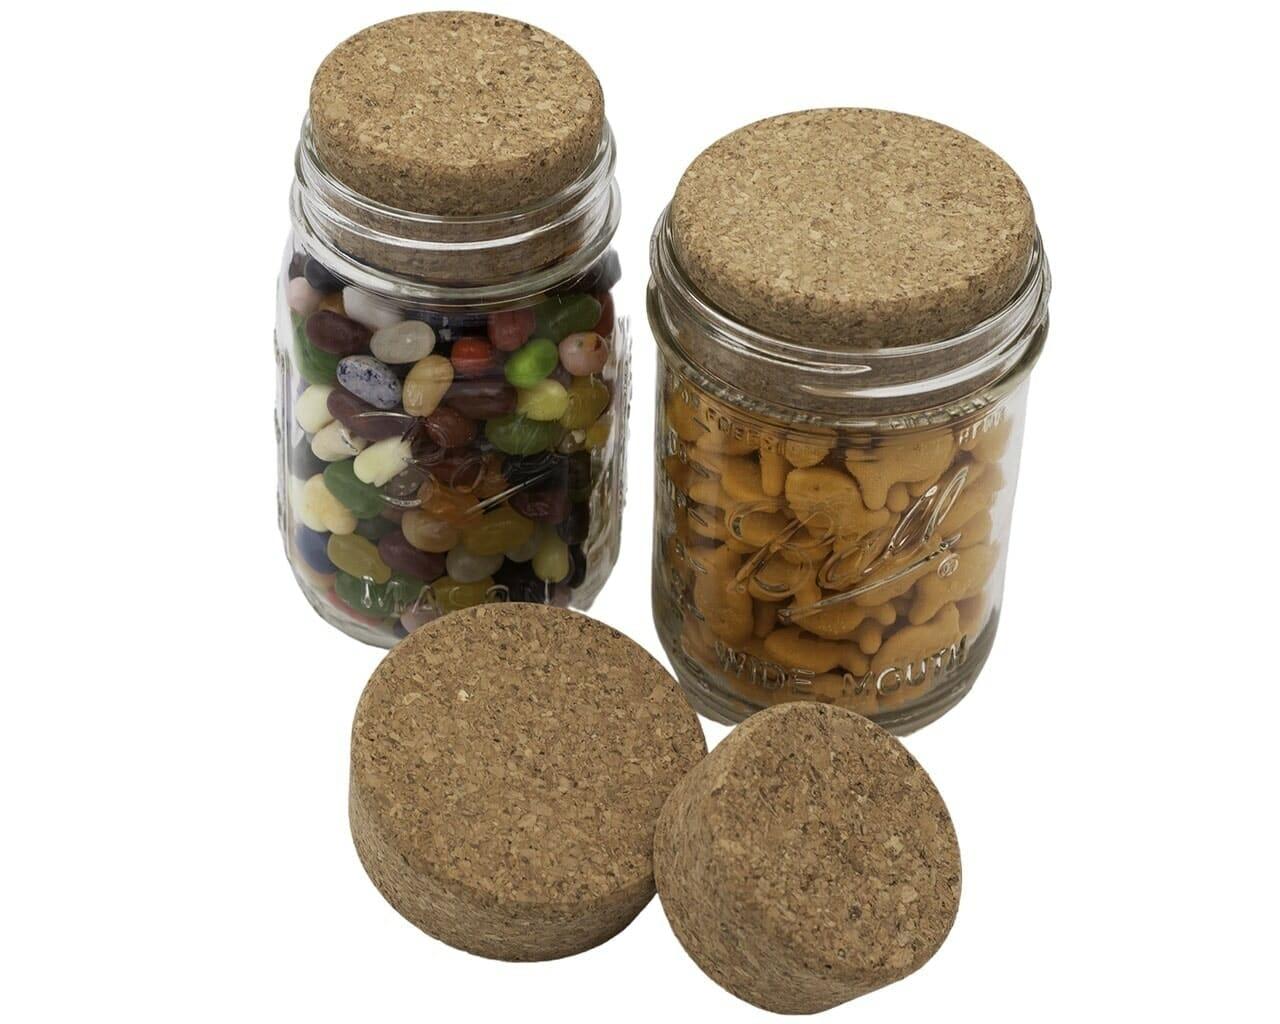 mason jar lifestyle cork lid cap stopper regular wide mouth ball kerr mason jars candy goldfish crackers